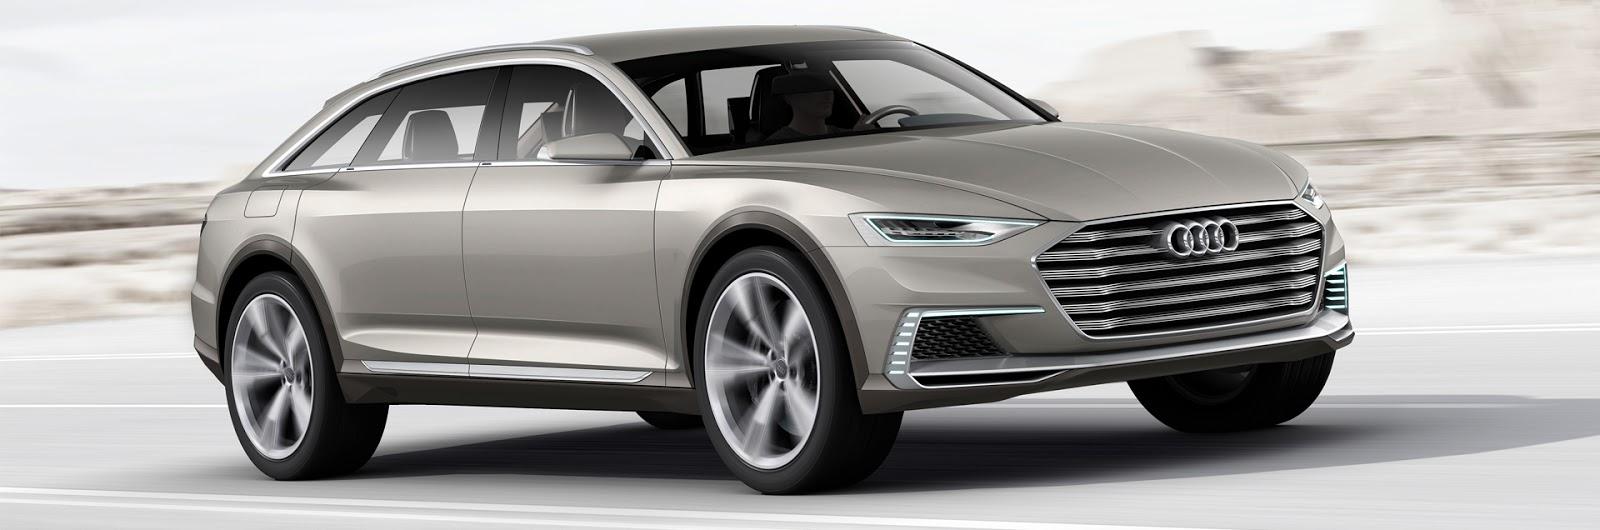 Audi prologue avant oficjalnie